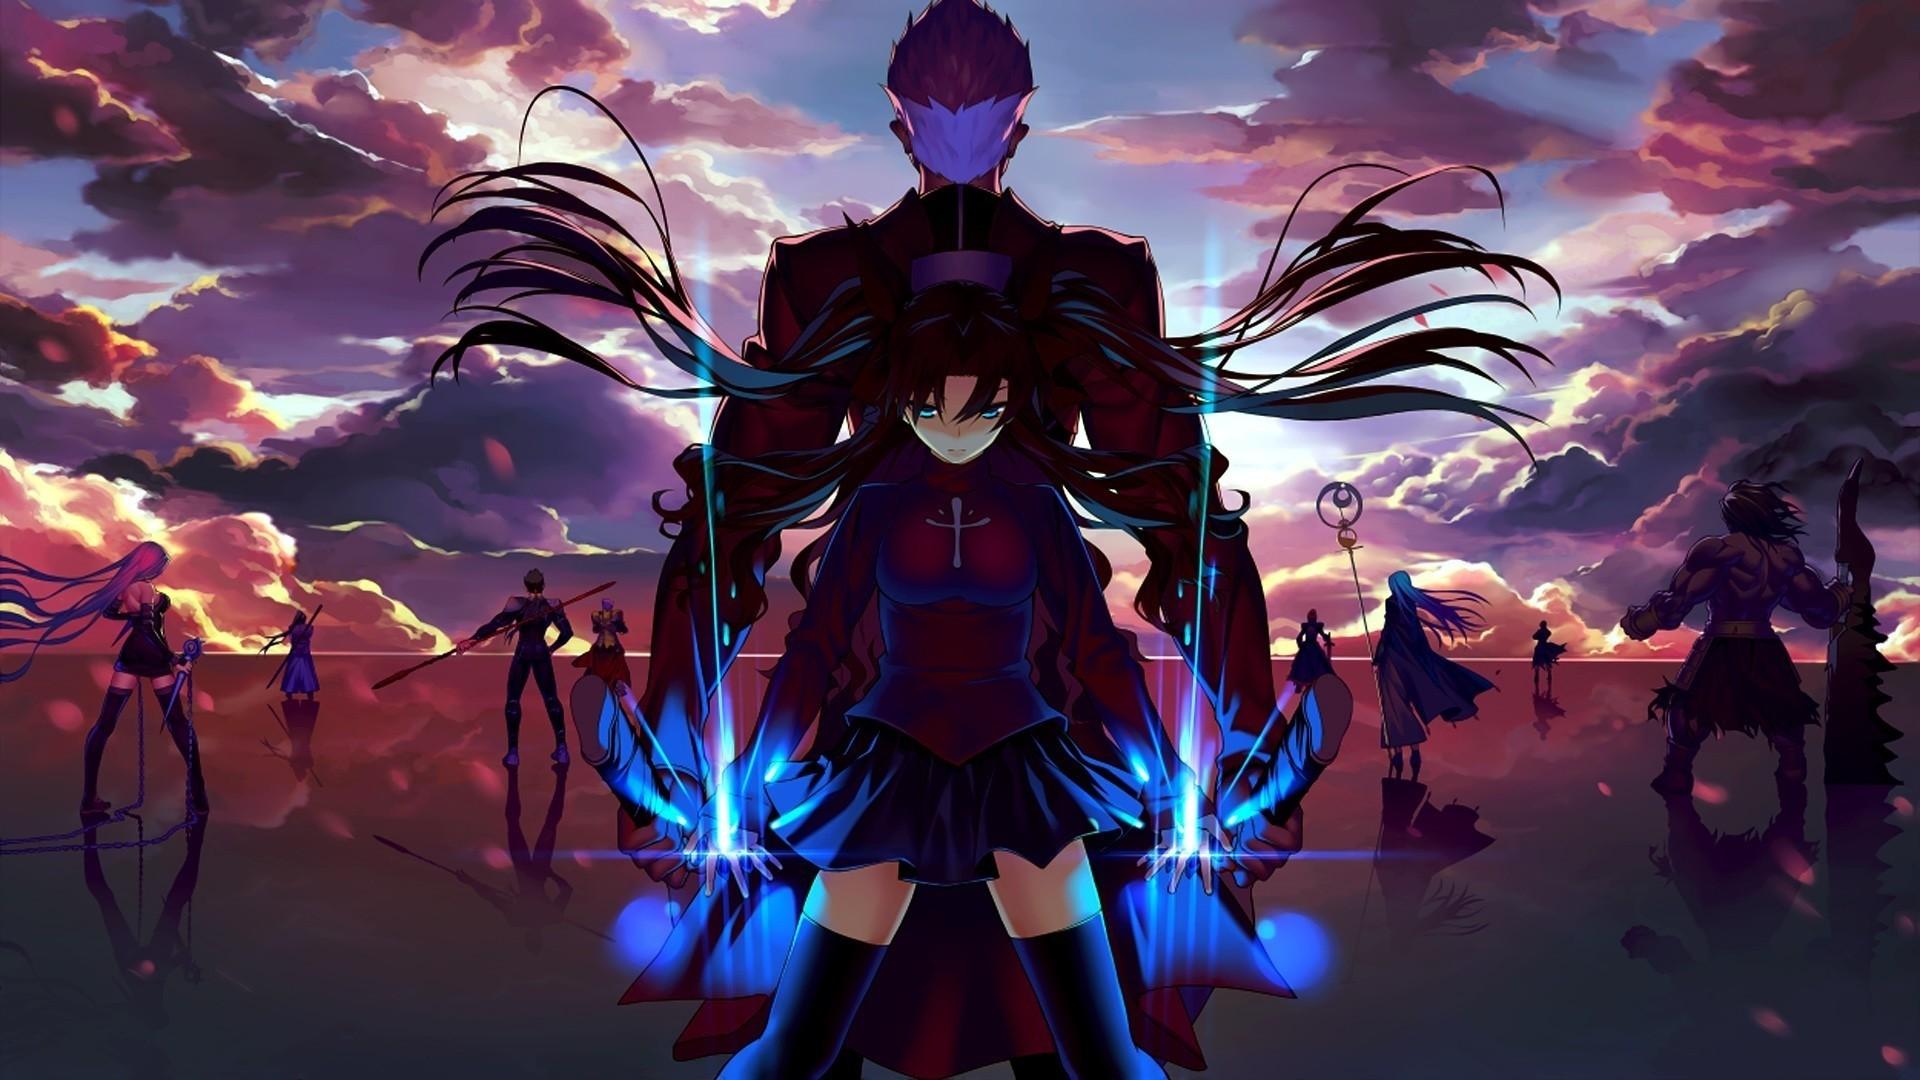 Cool Anime Desktop Wallpaper 4k